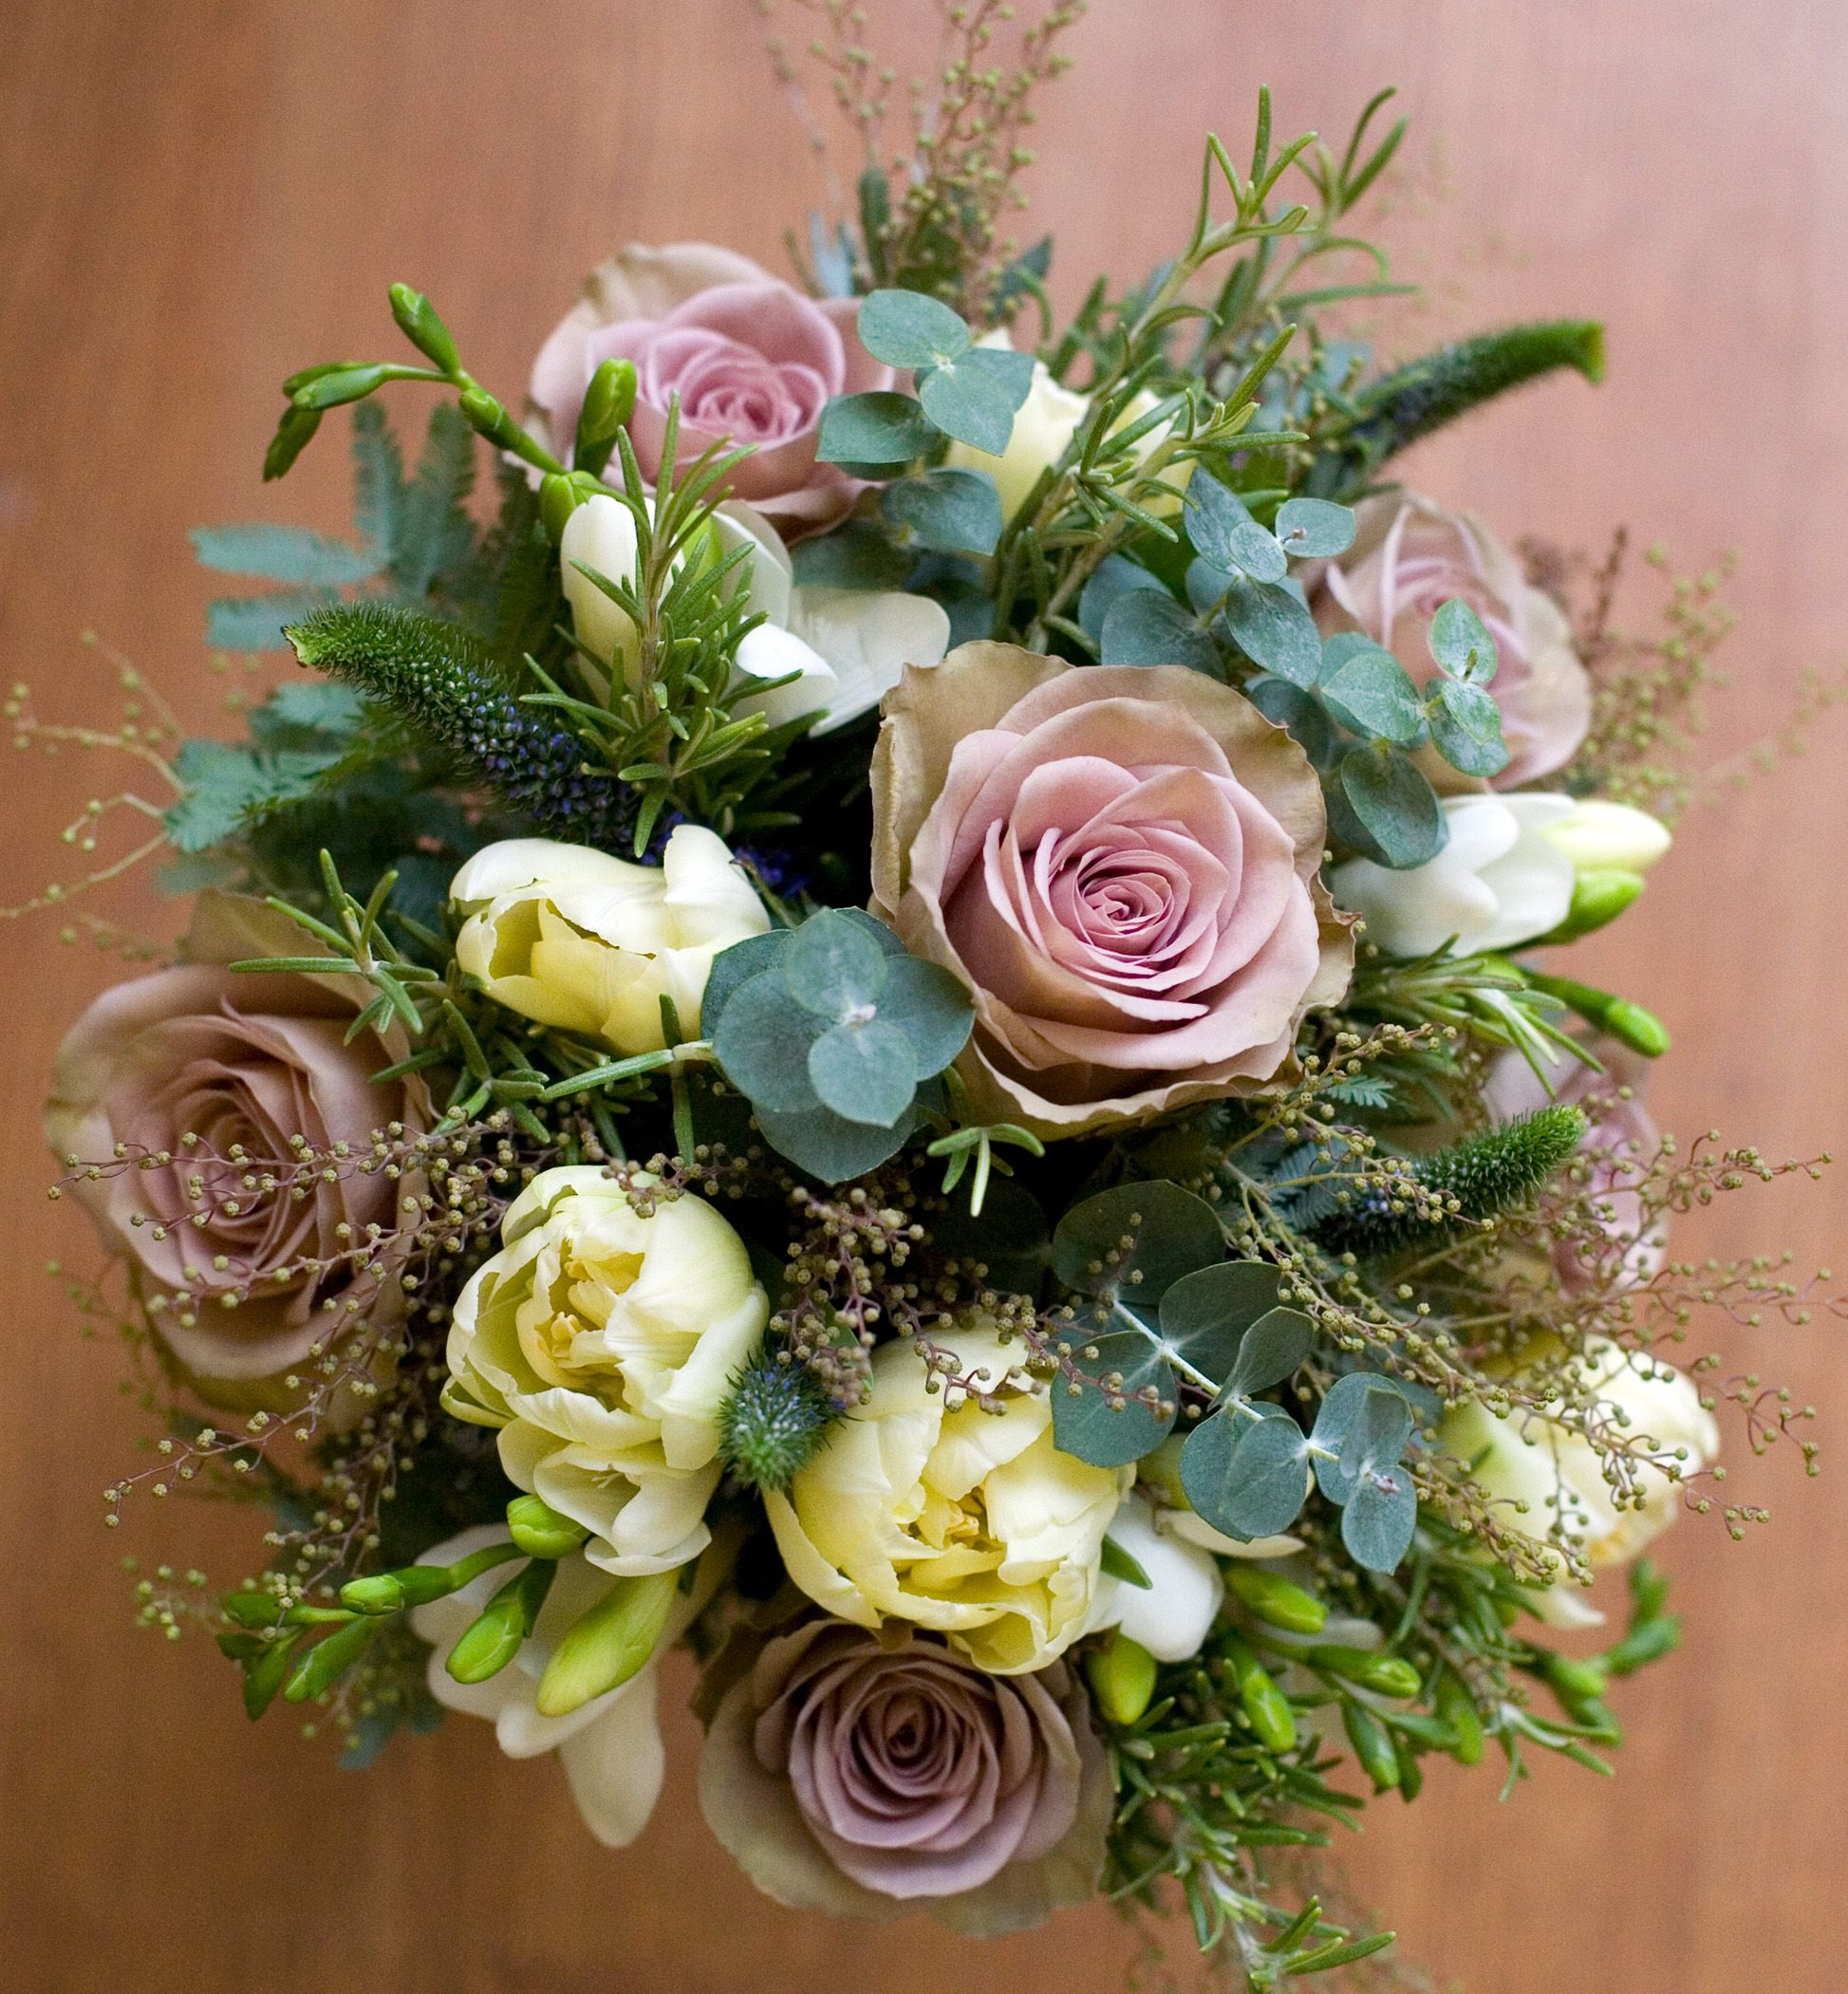 Vanillarose.co.uk Hand Tied Bridal Bouquet With Amnesia